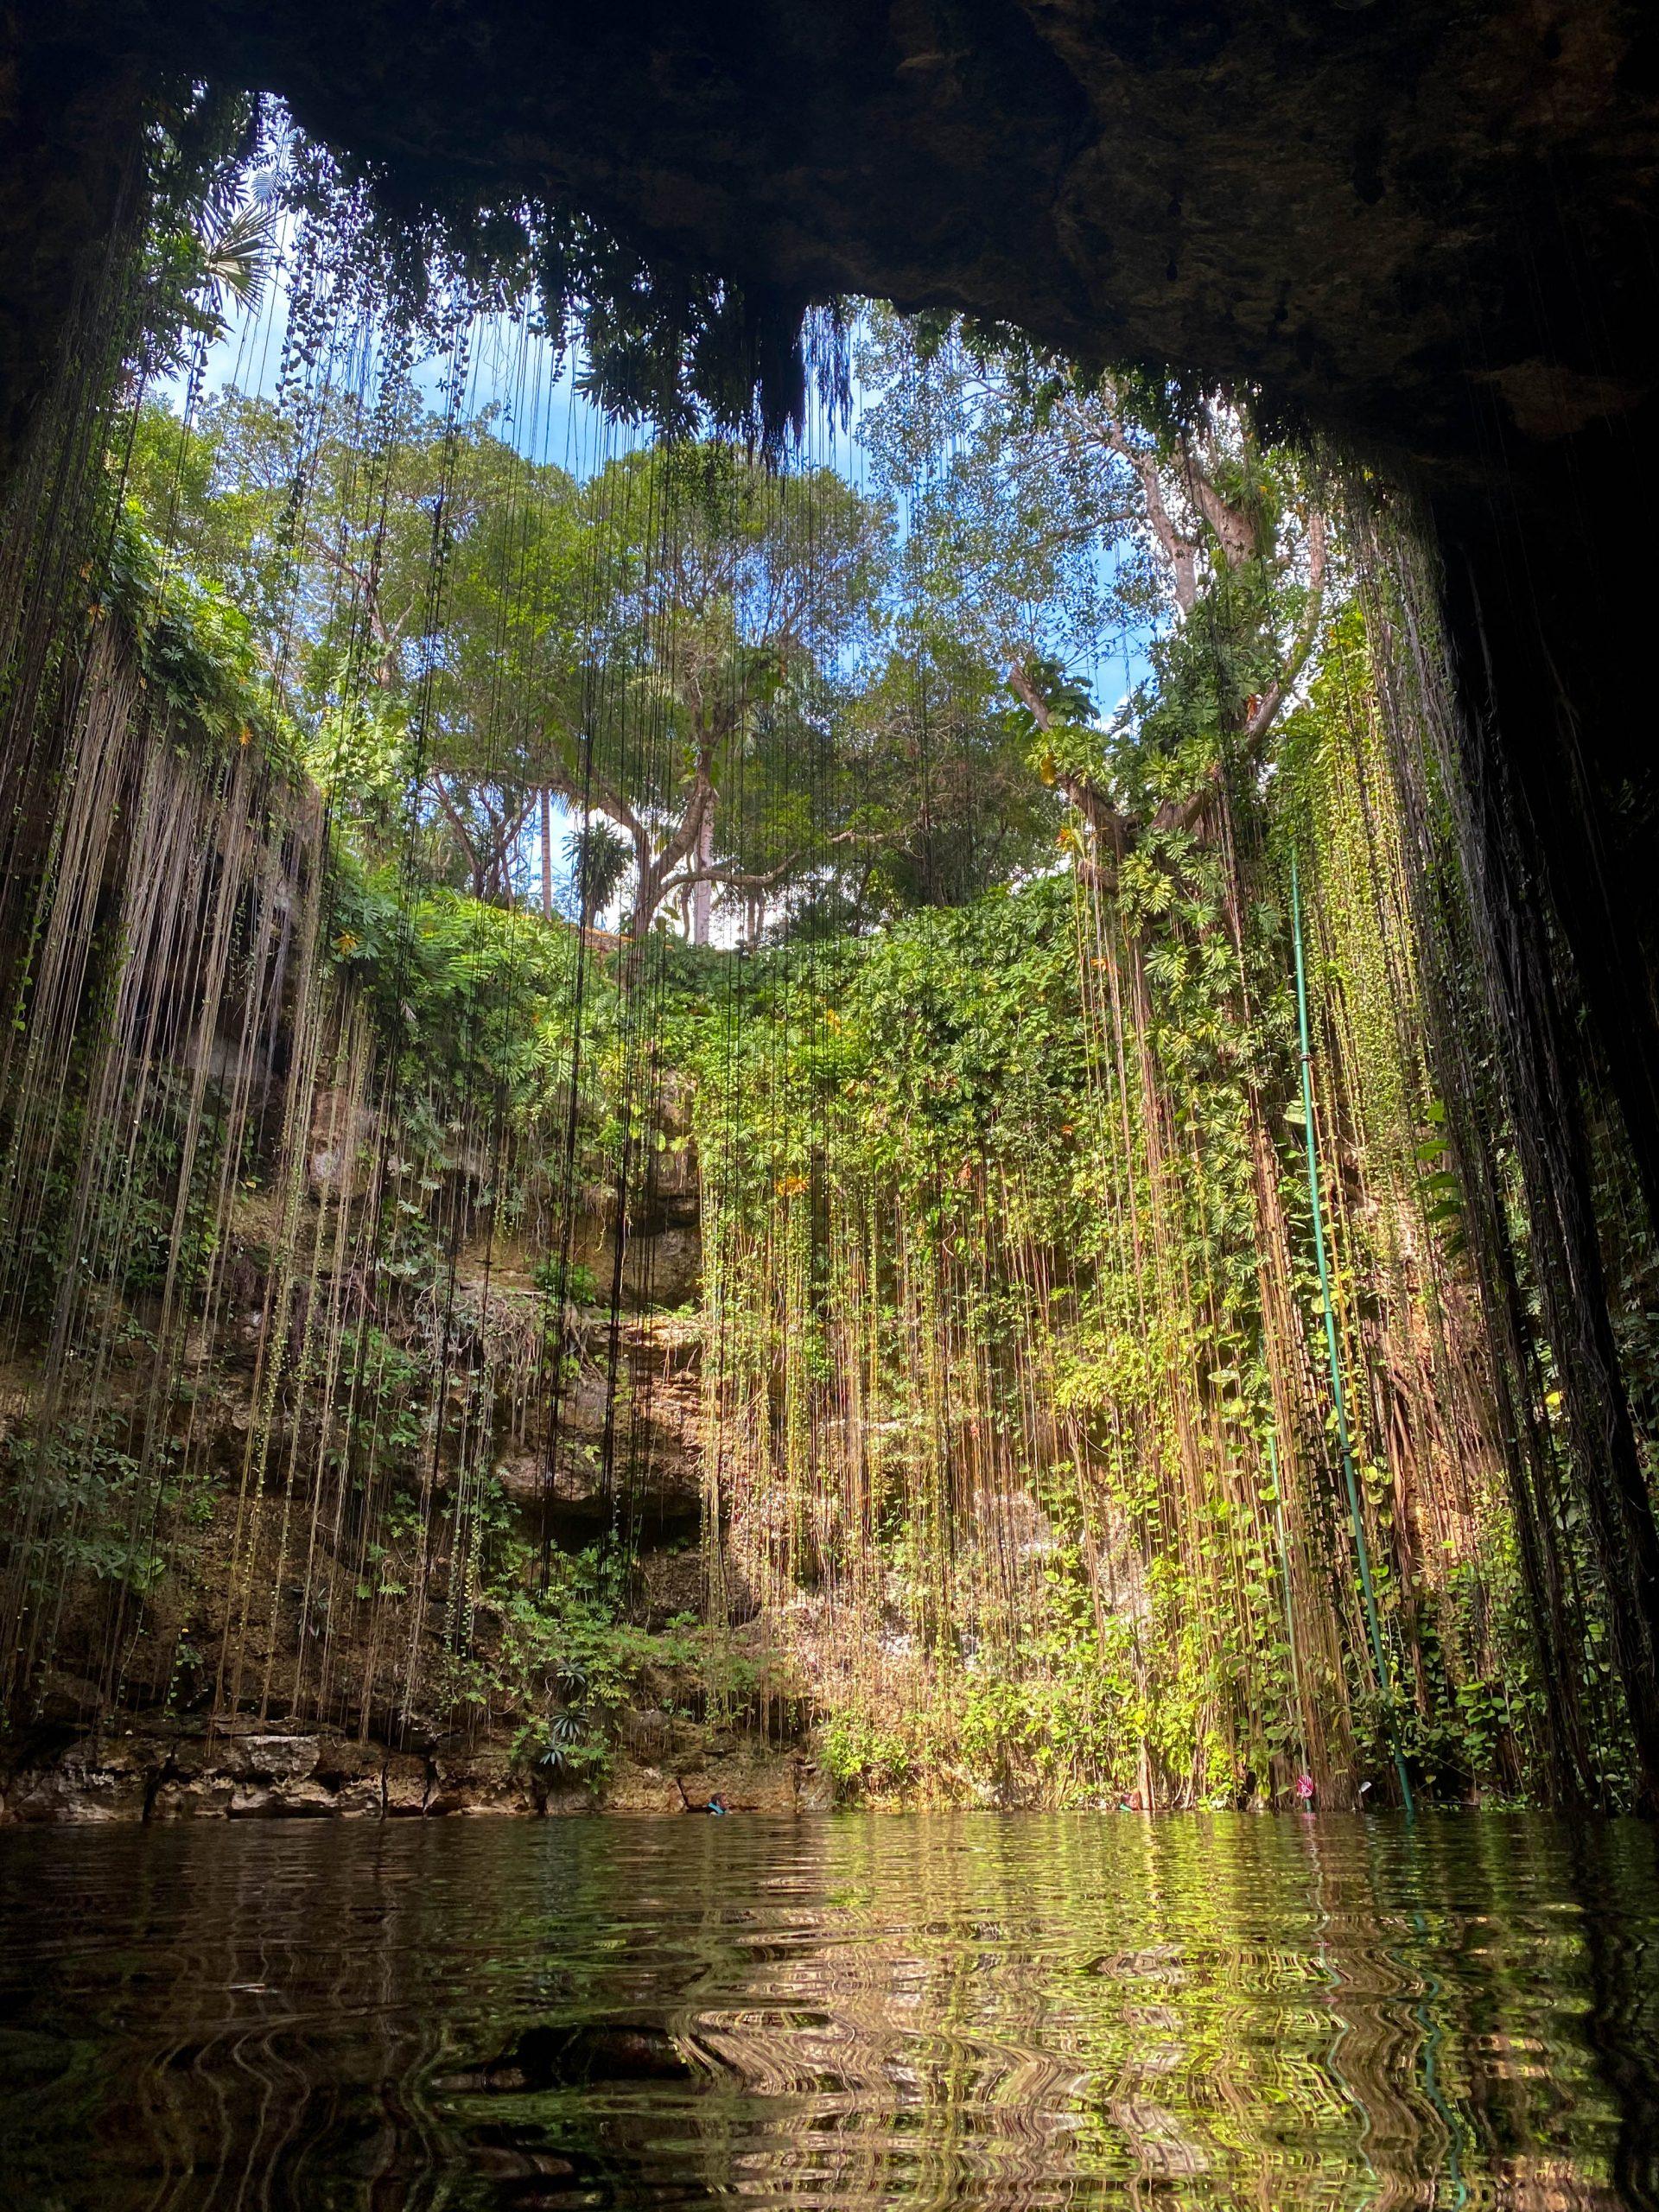 Visiting Cenote Ik Kil, Yucatan, Mexico - a Complete Guide